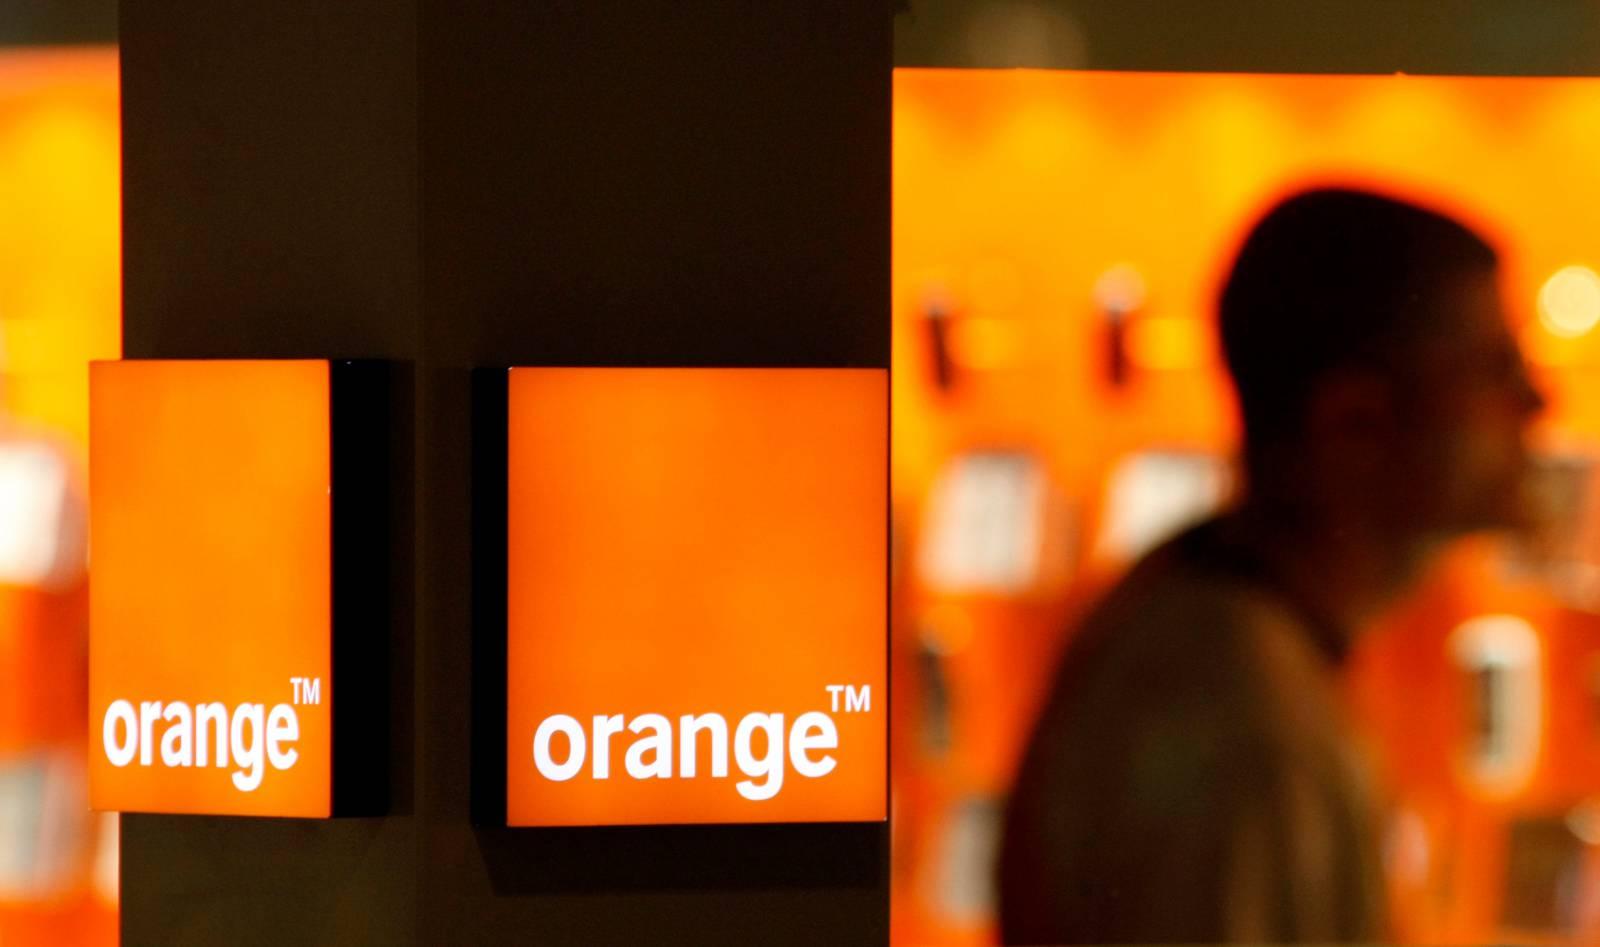 Orange are pre BLACK FRIDAY 2019 Oferte EXCELENTE la aceste Modele de Telefoane